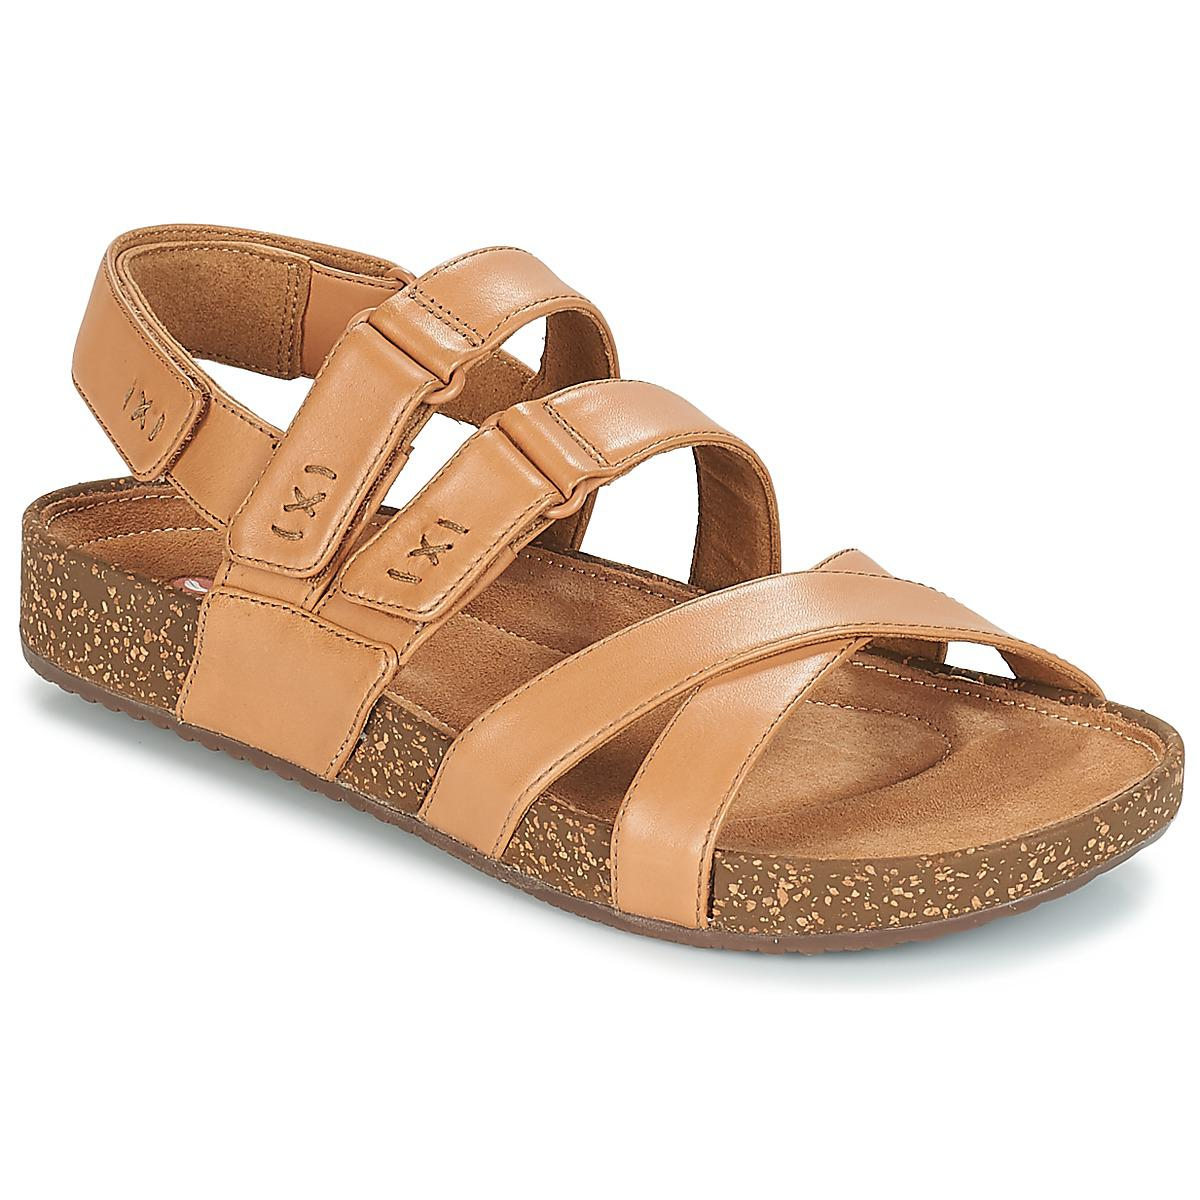 b46845200c35 Clarks Rosilla Keene Light Sandals in Brown - Lyst